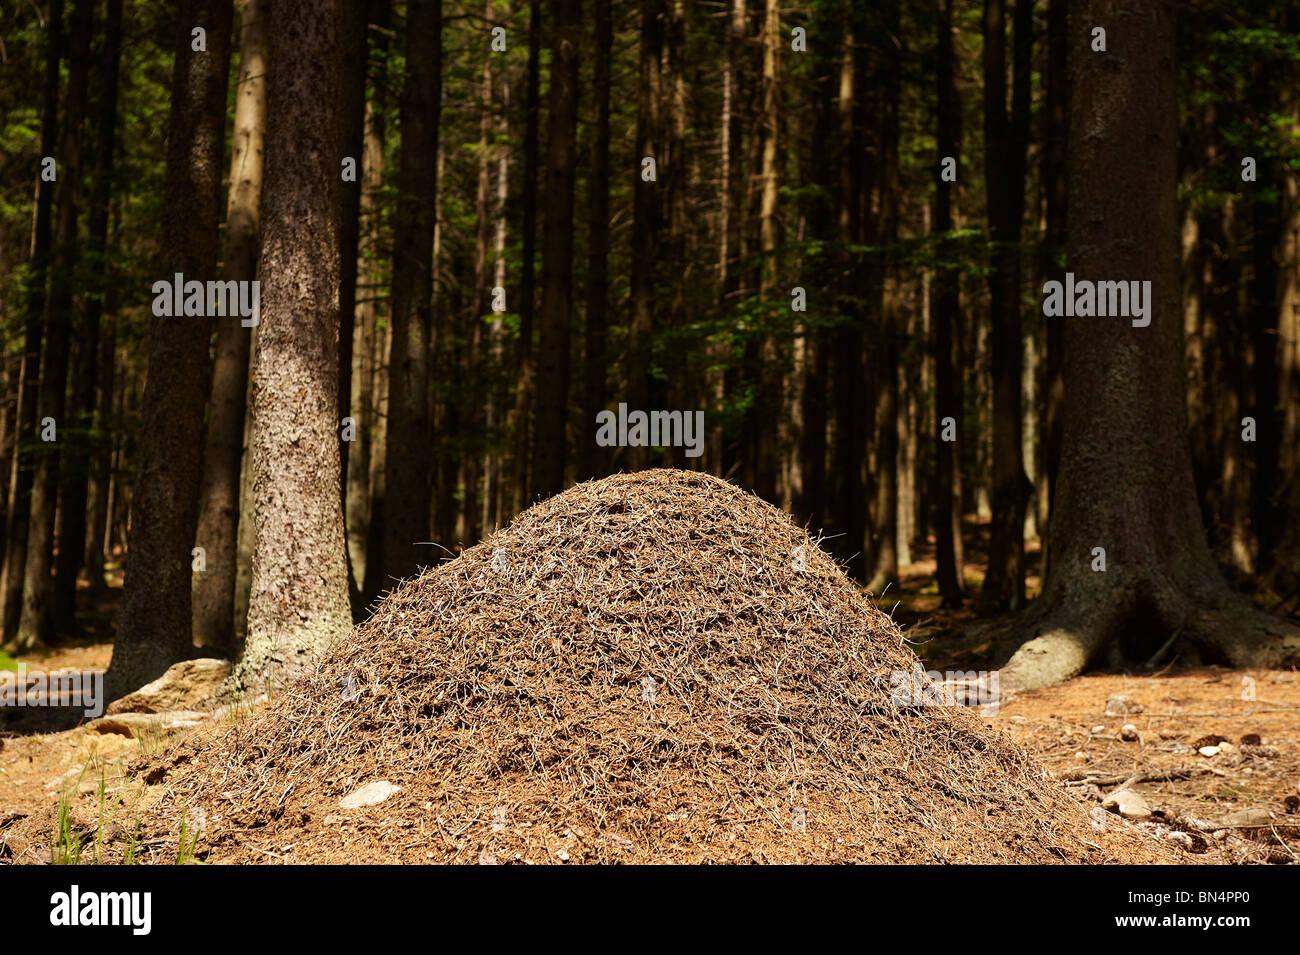 Anthill, ants colony, Spicak hill, Zelezna Ruda, NP Sumava, Ceska republika - Stock Image